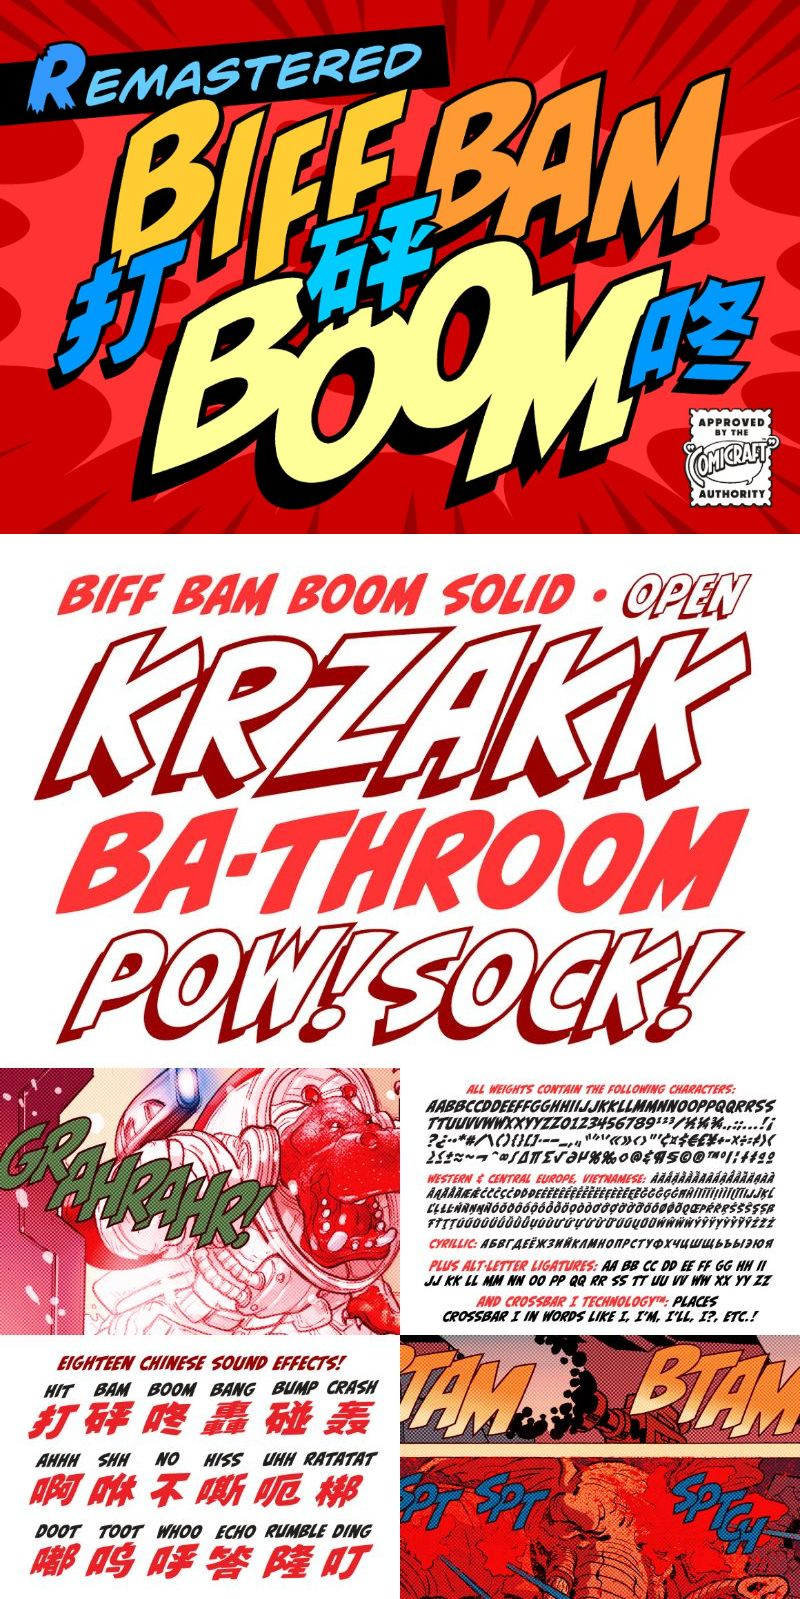 Biff Bam Boom